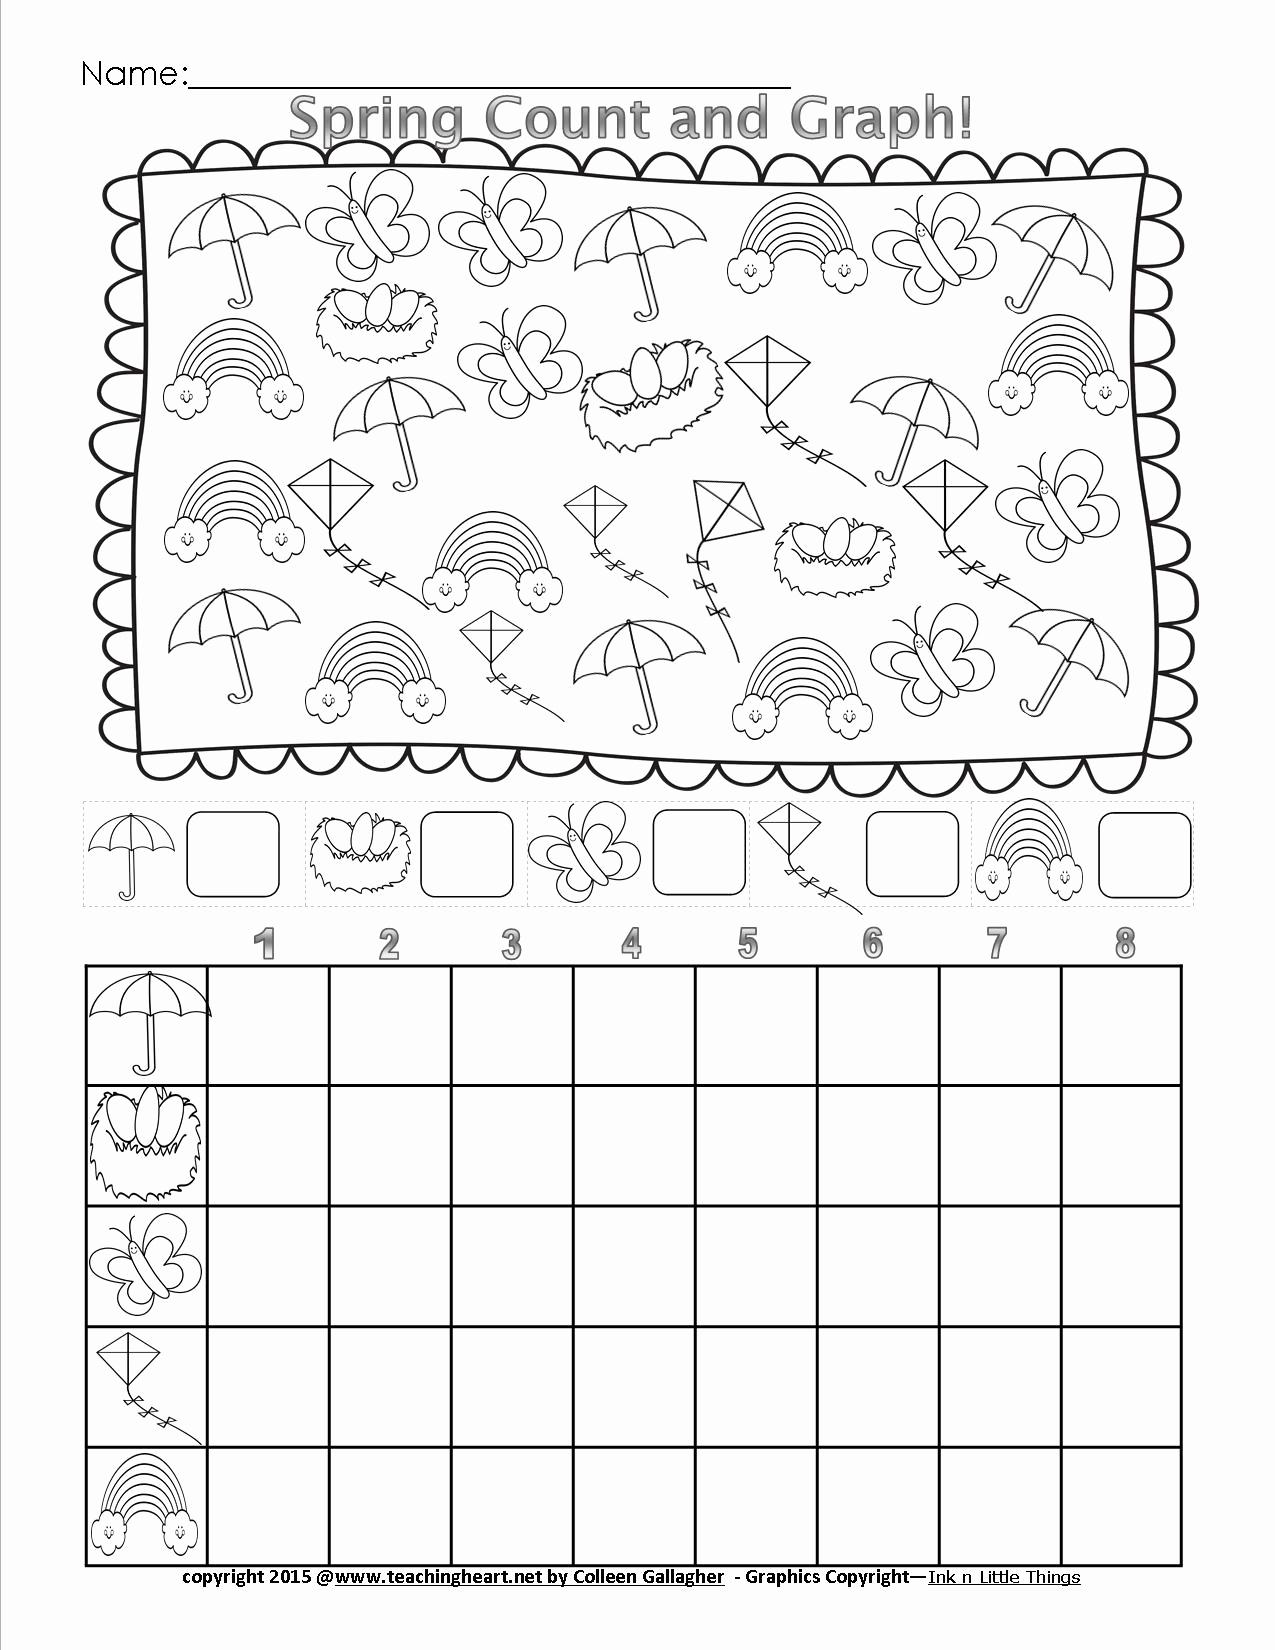 Kindergarten Math sorting Worksheets Elegant 13 Best Of Counting Objects Kindergarten Math